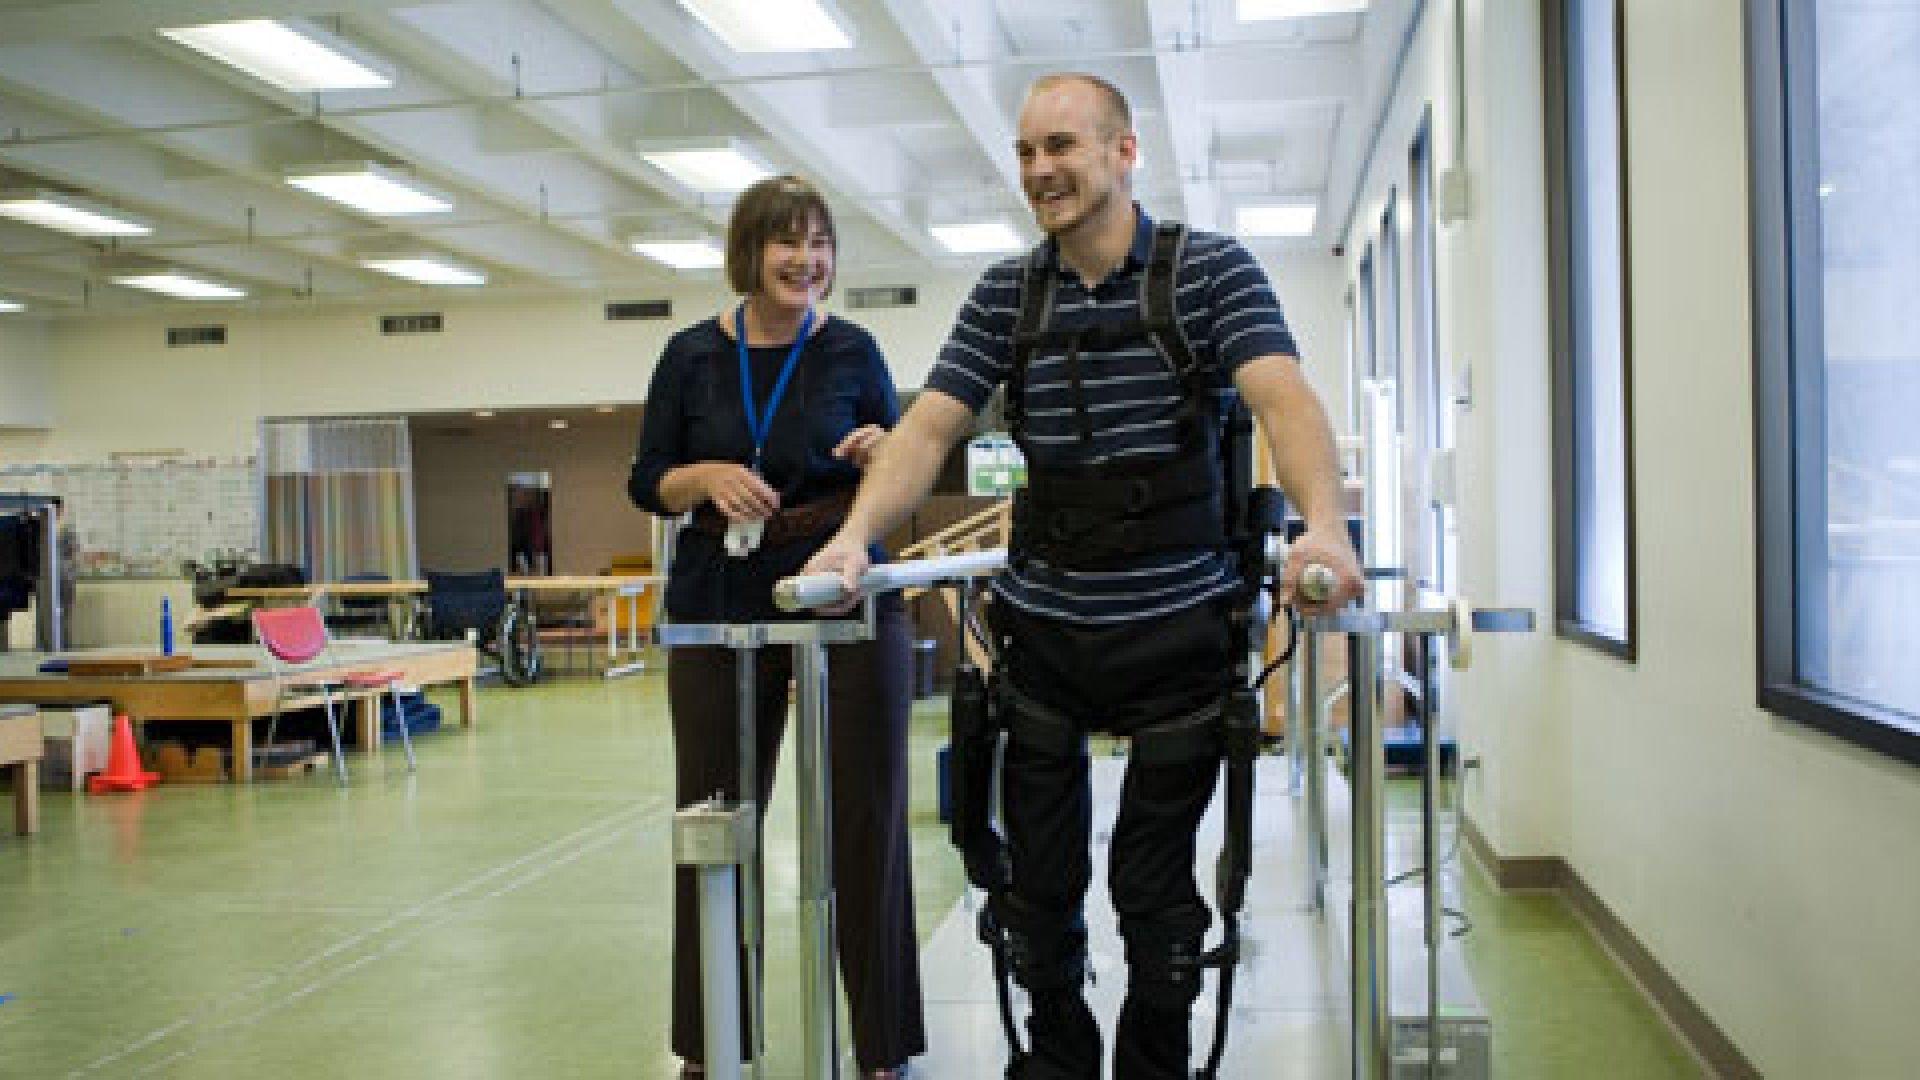 Inc. 5000 Applicant of the Week: Berkeley Bionics